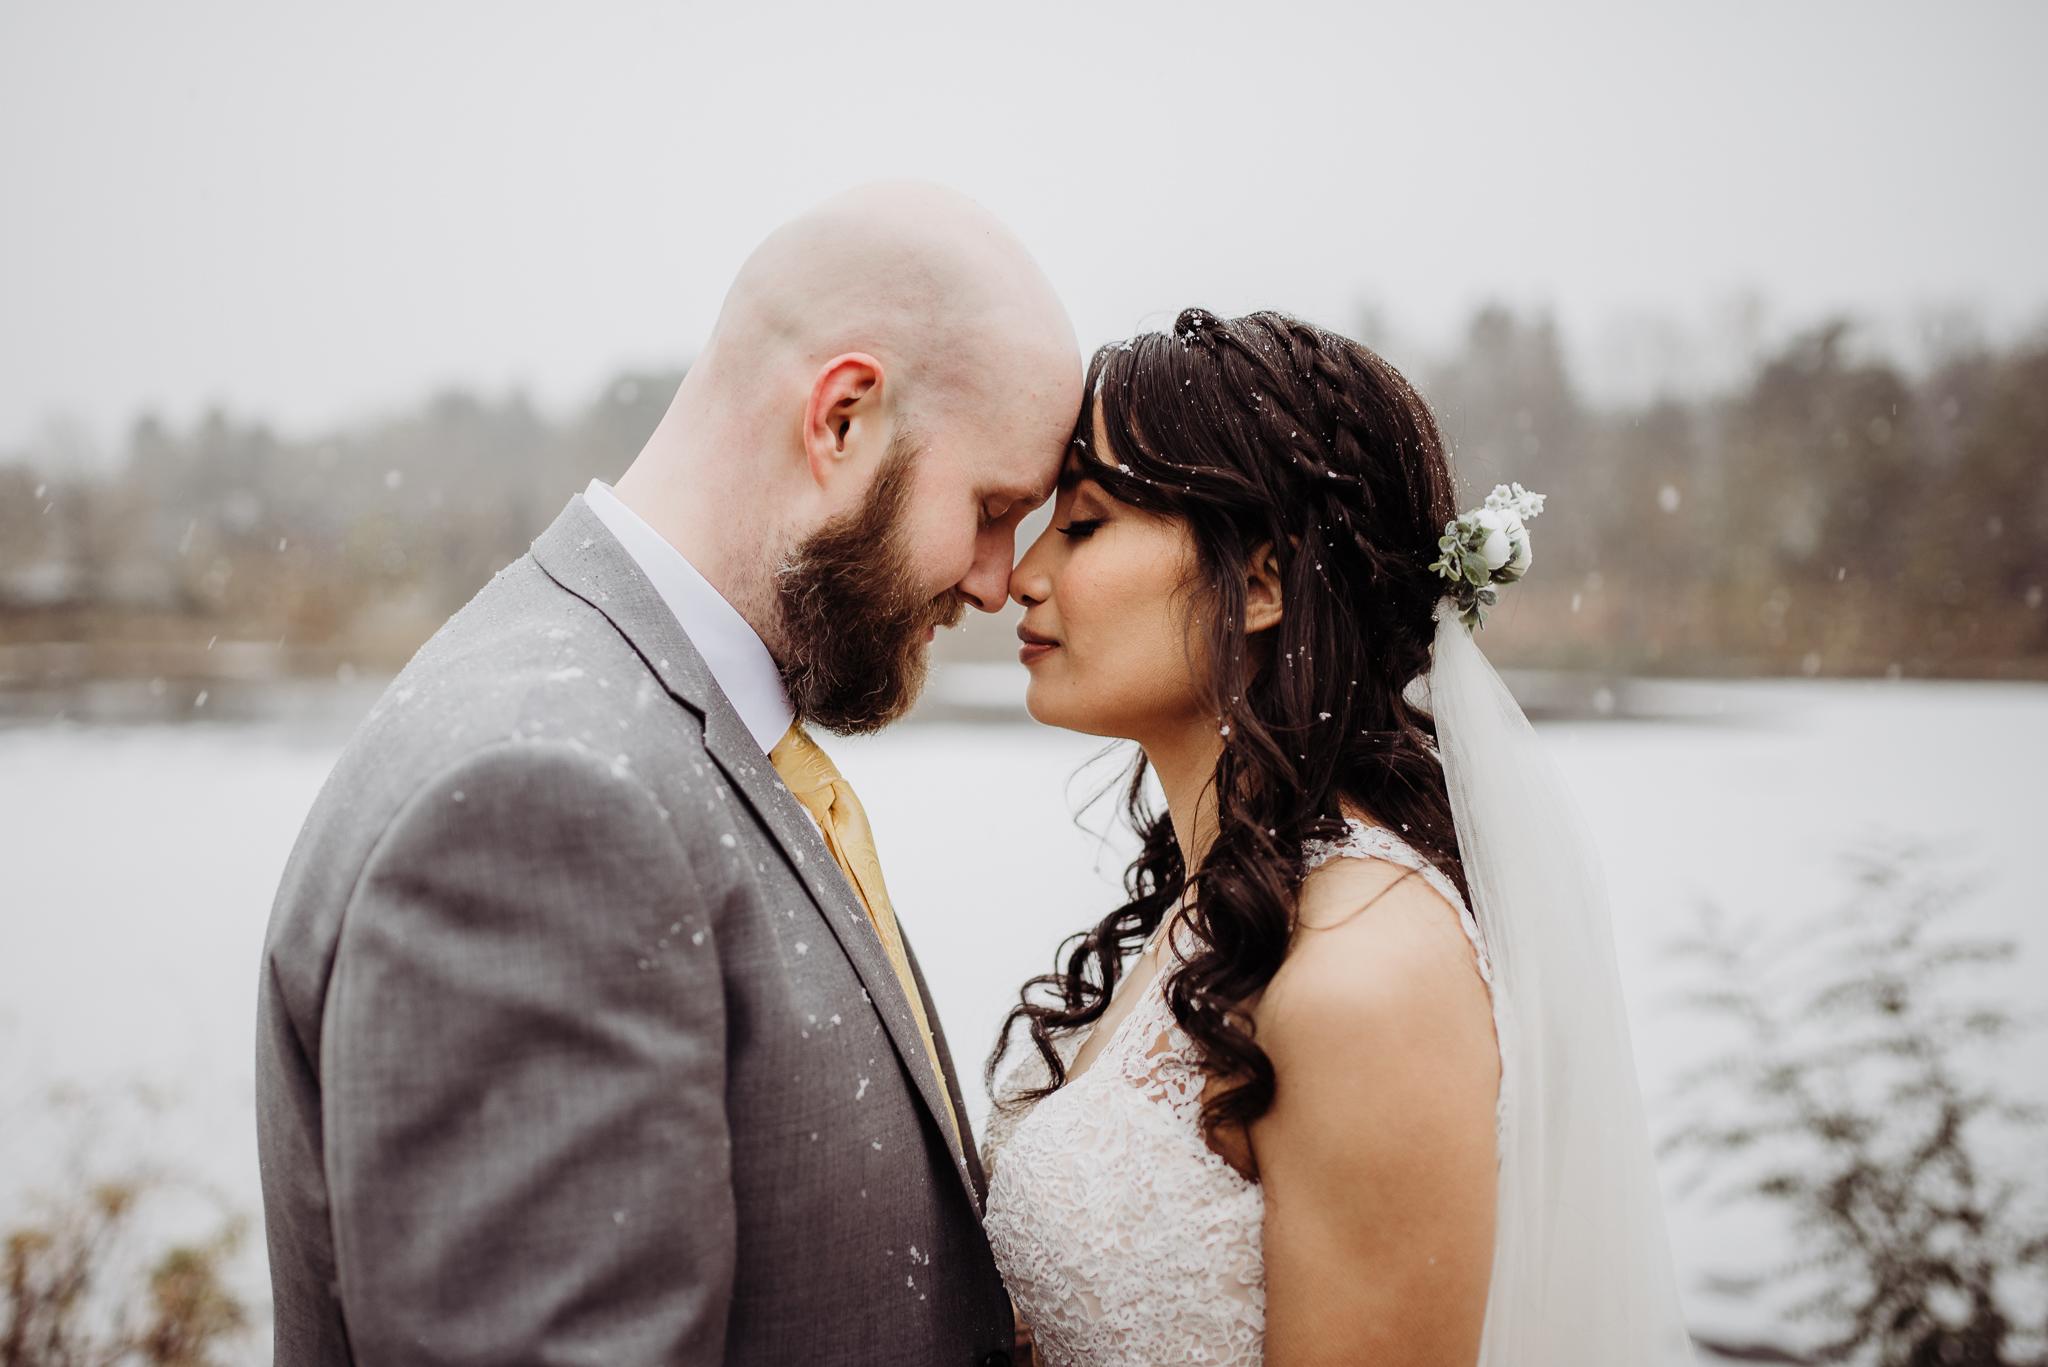 corinna Maine wedding Photography-15.jpg